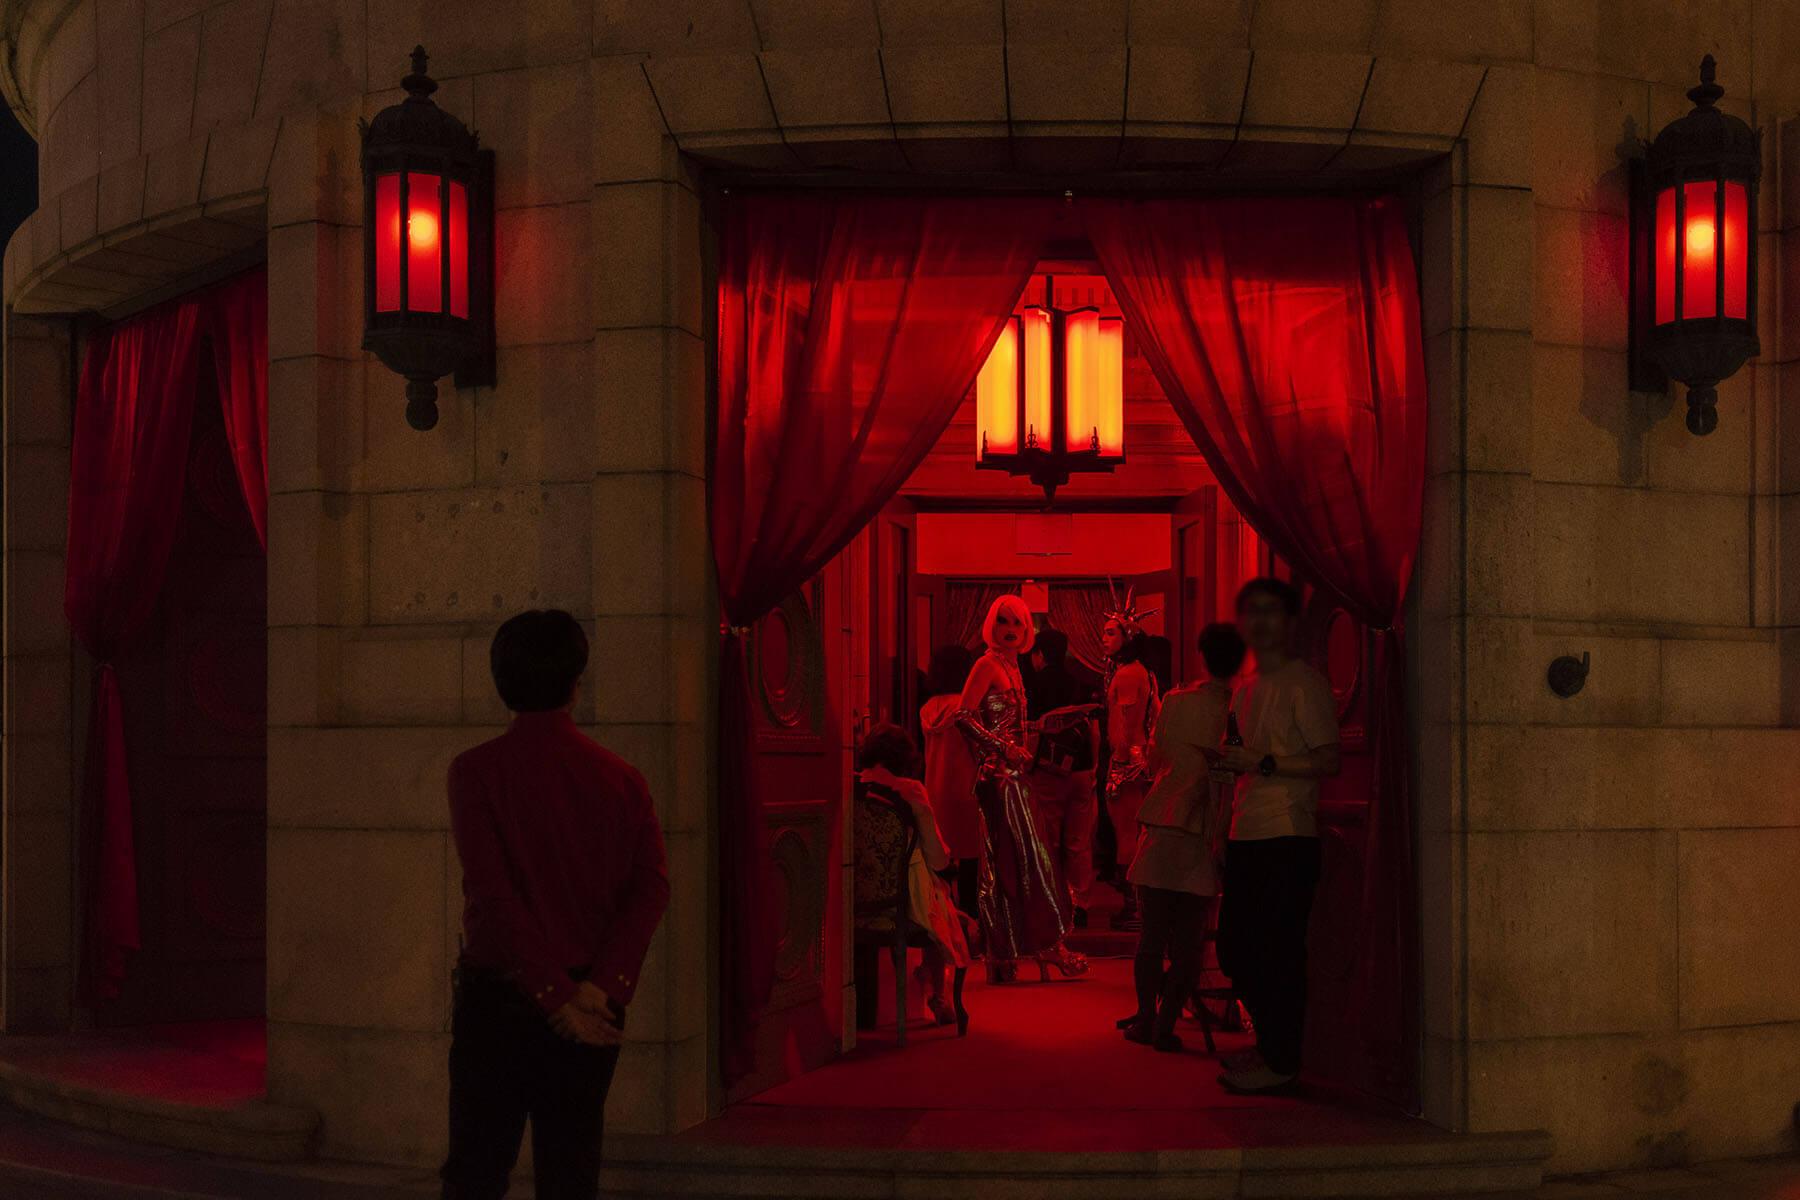 RED ROOM #4 PHOTOS 現代美術・アート Contemporary Art オフソサエティ offsociety